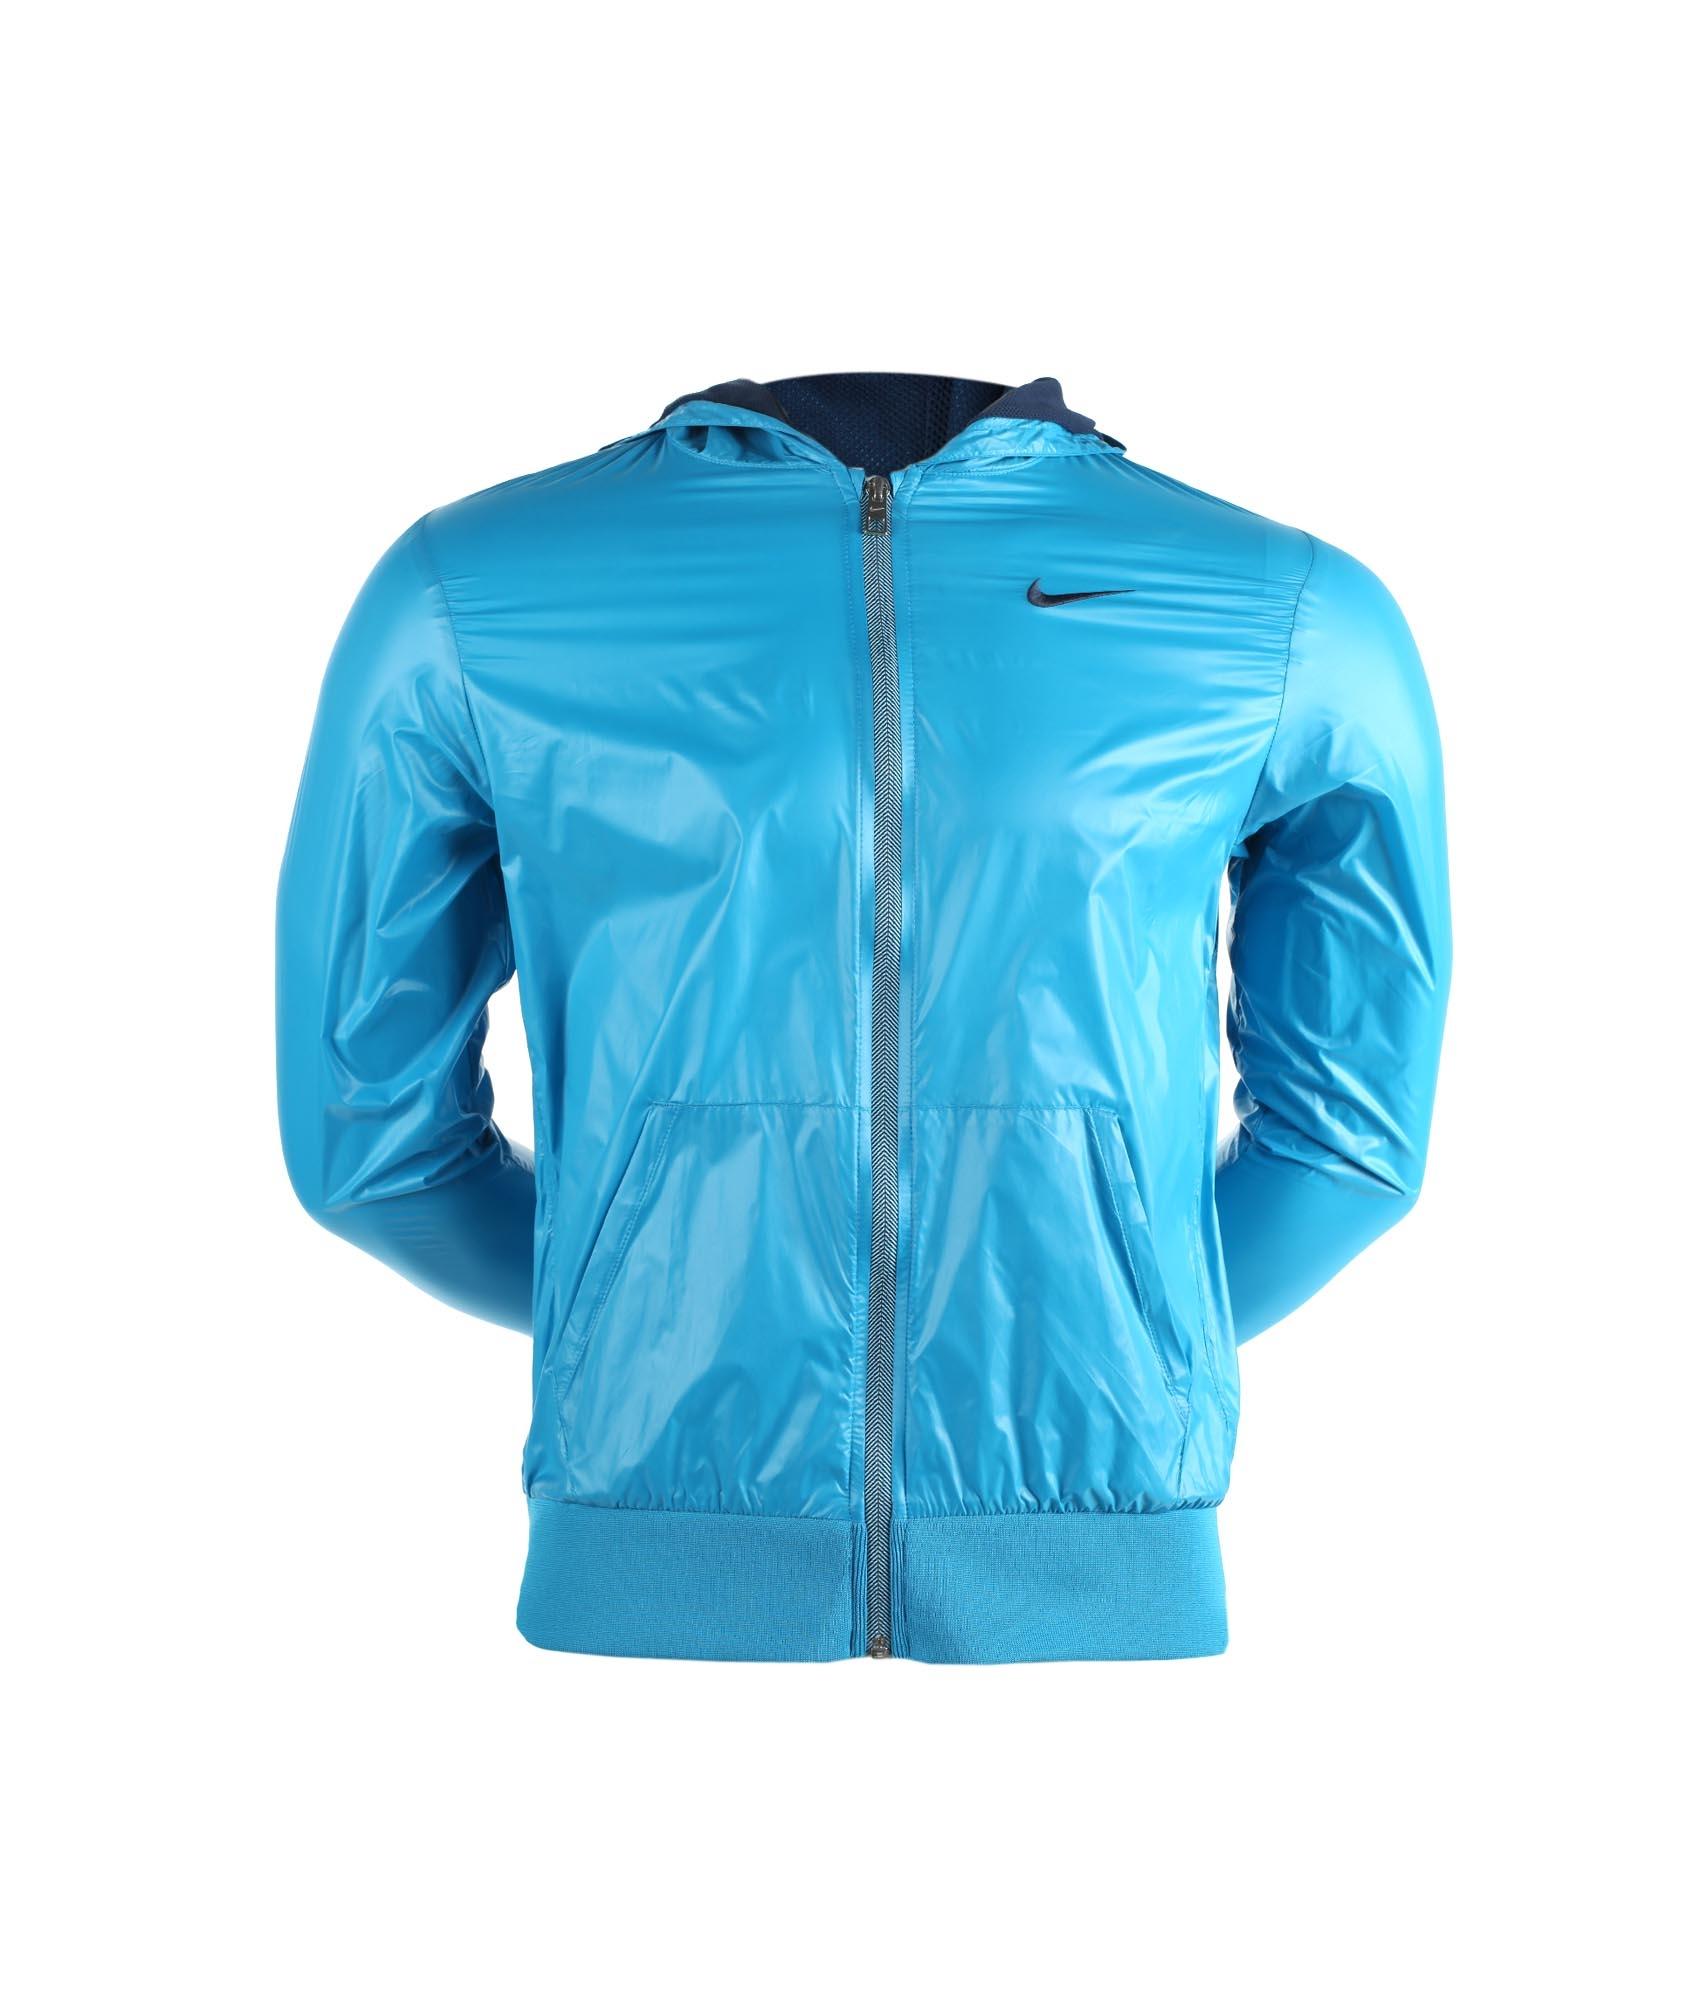 Куртка Nike YA76 ULTRA LGTWHT JKT-YTH, Цвет-Голубой, Размер-S